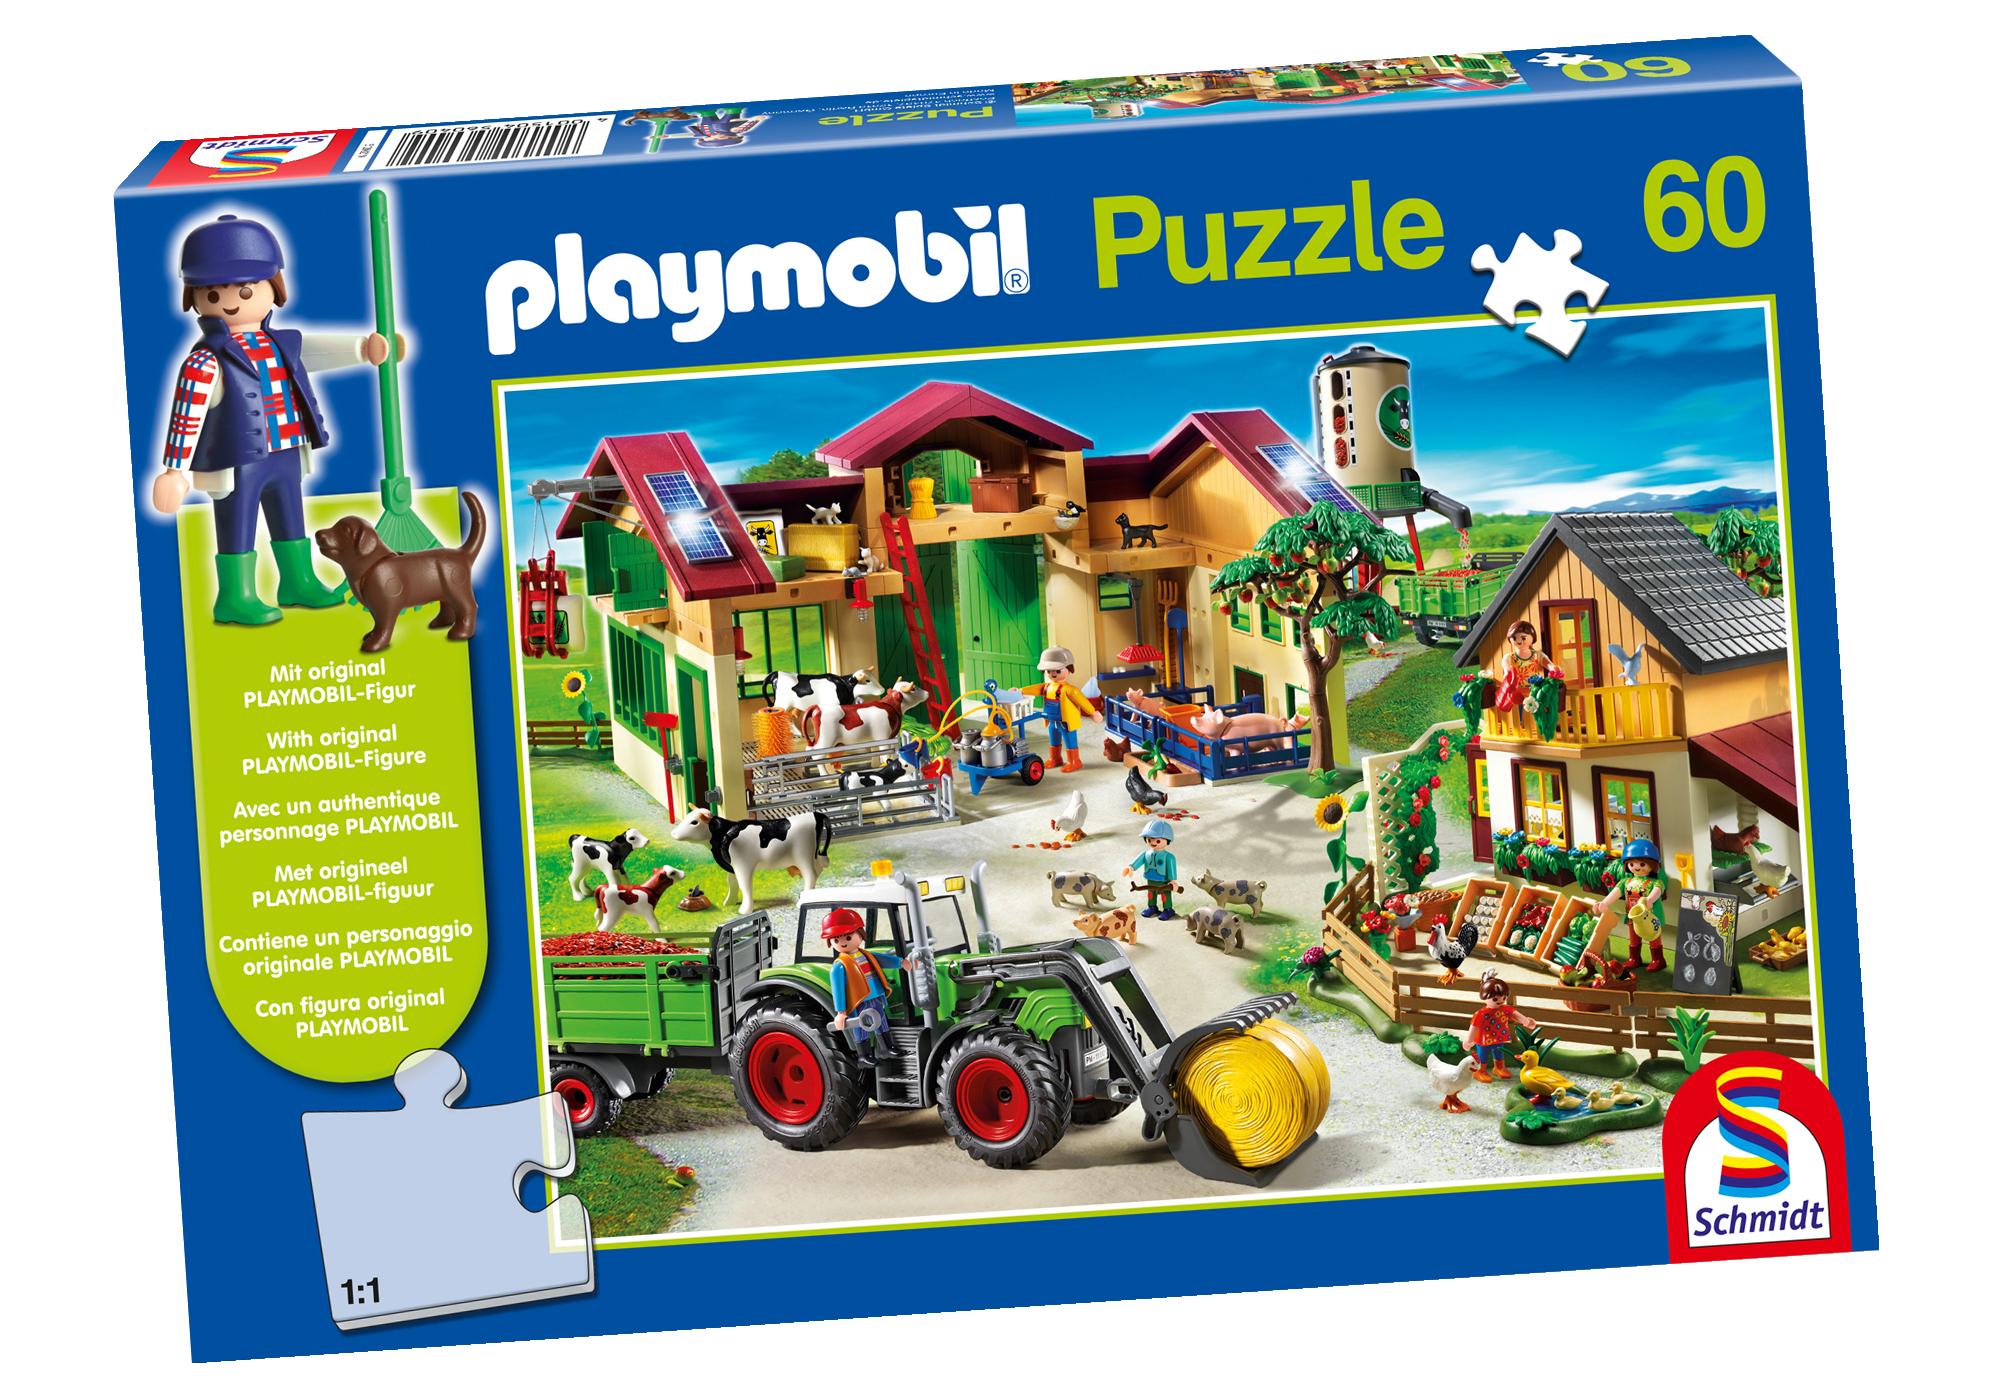 http://media.playmobil.com/i/playmobil/80352_product_detail